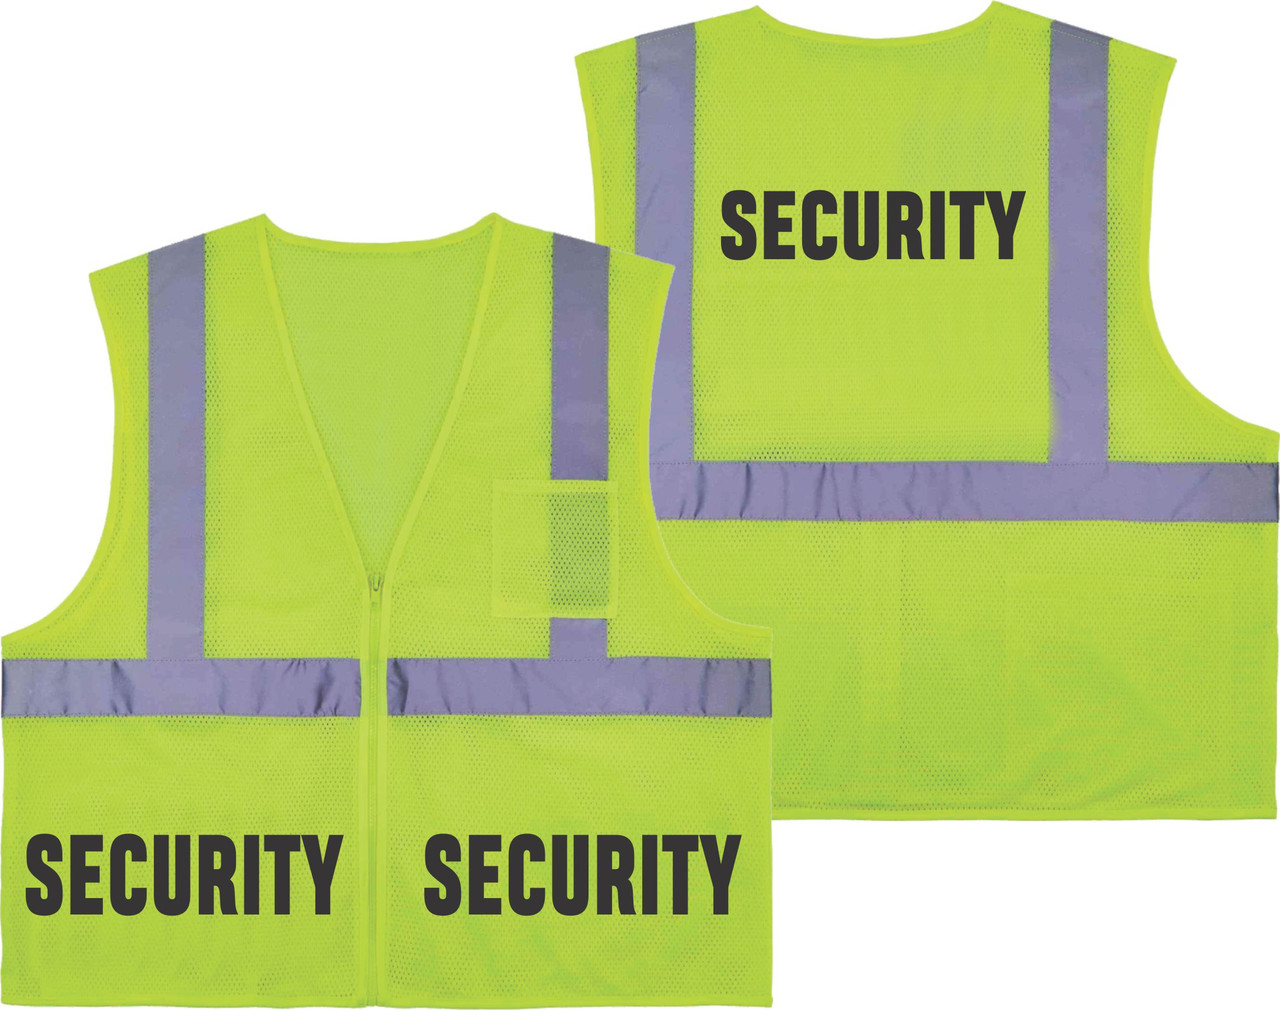 Printed SECURITY Safety Vest Class 2 - Great for Hi Vis Vest for Events